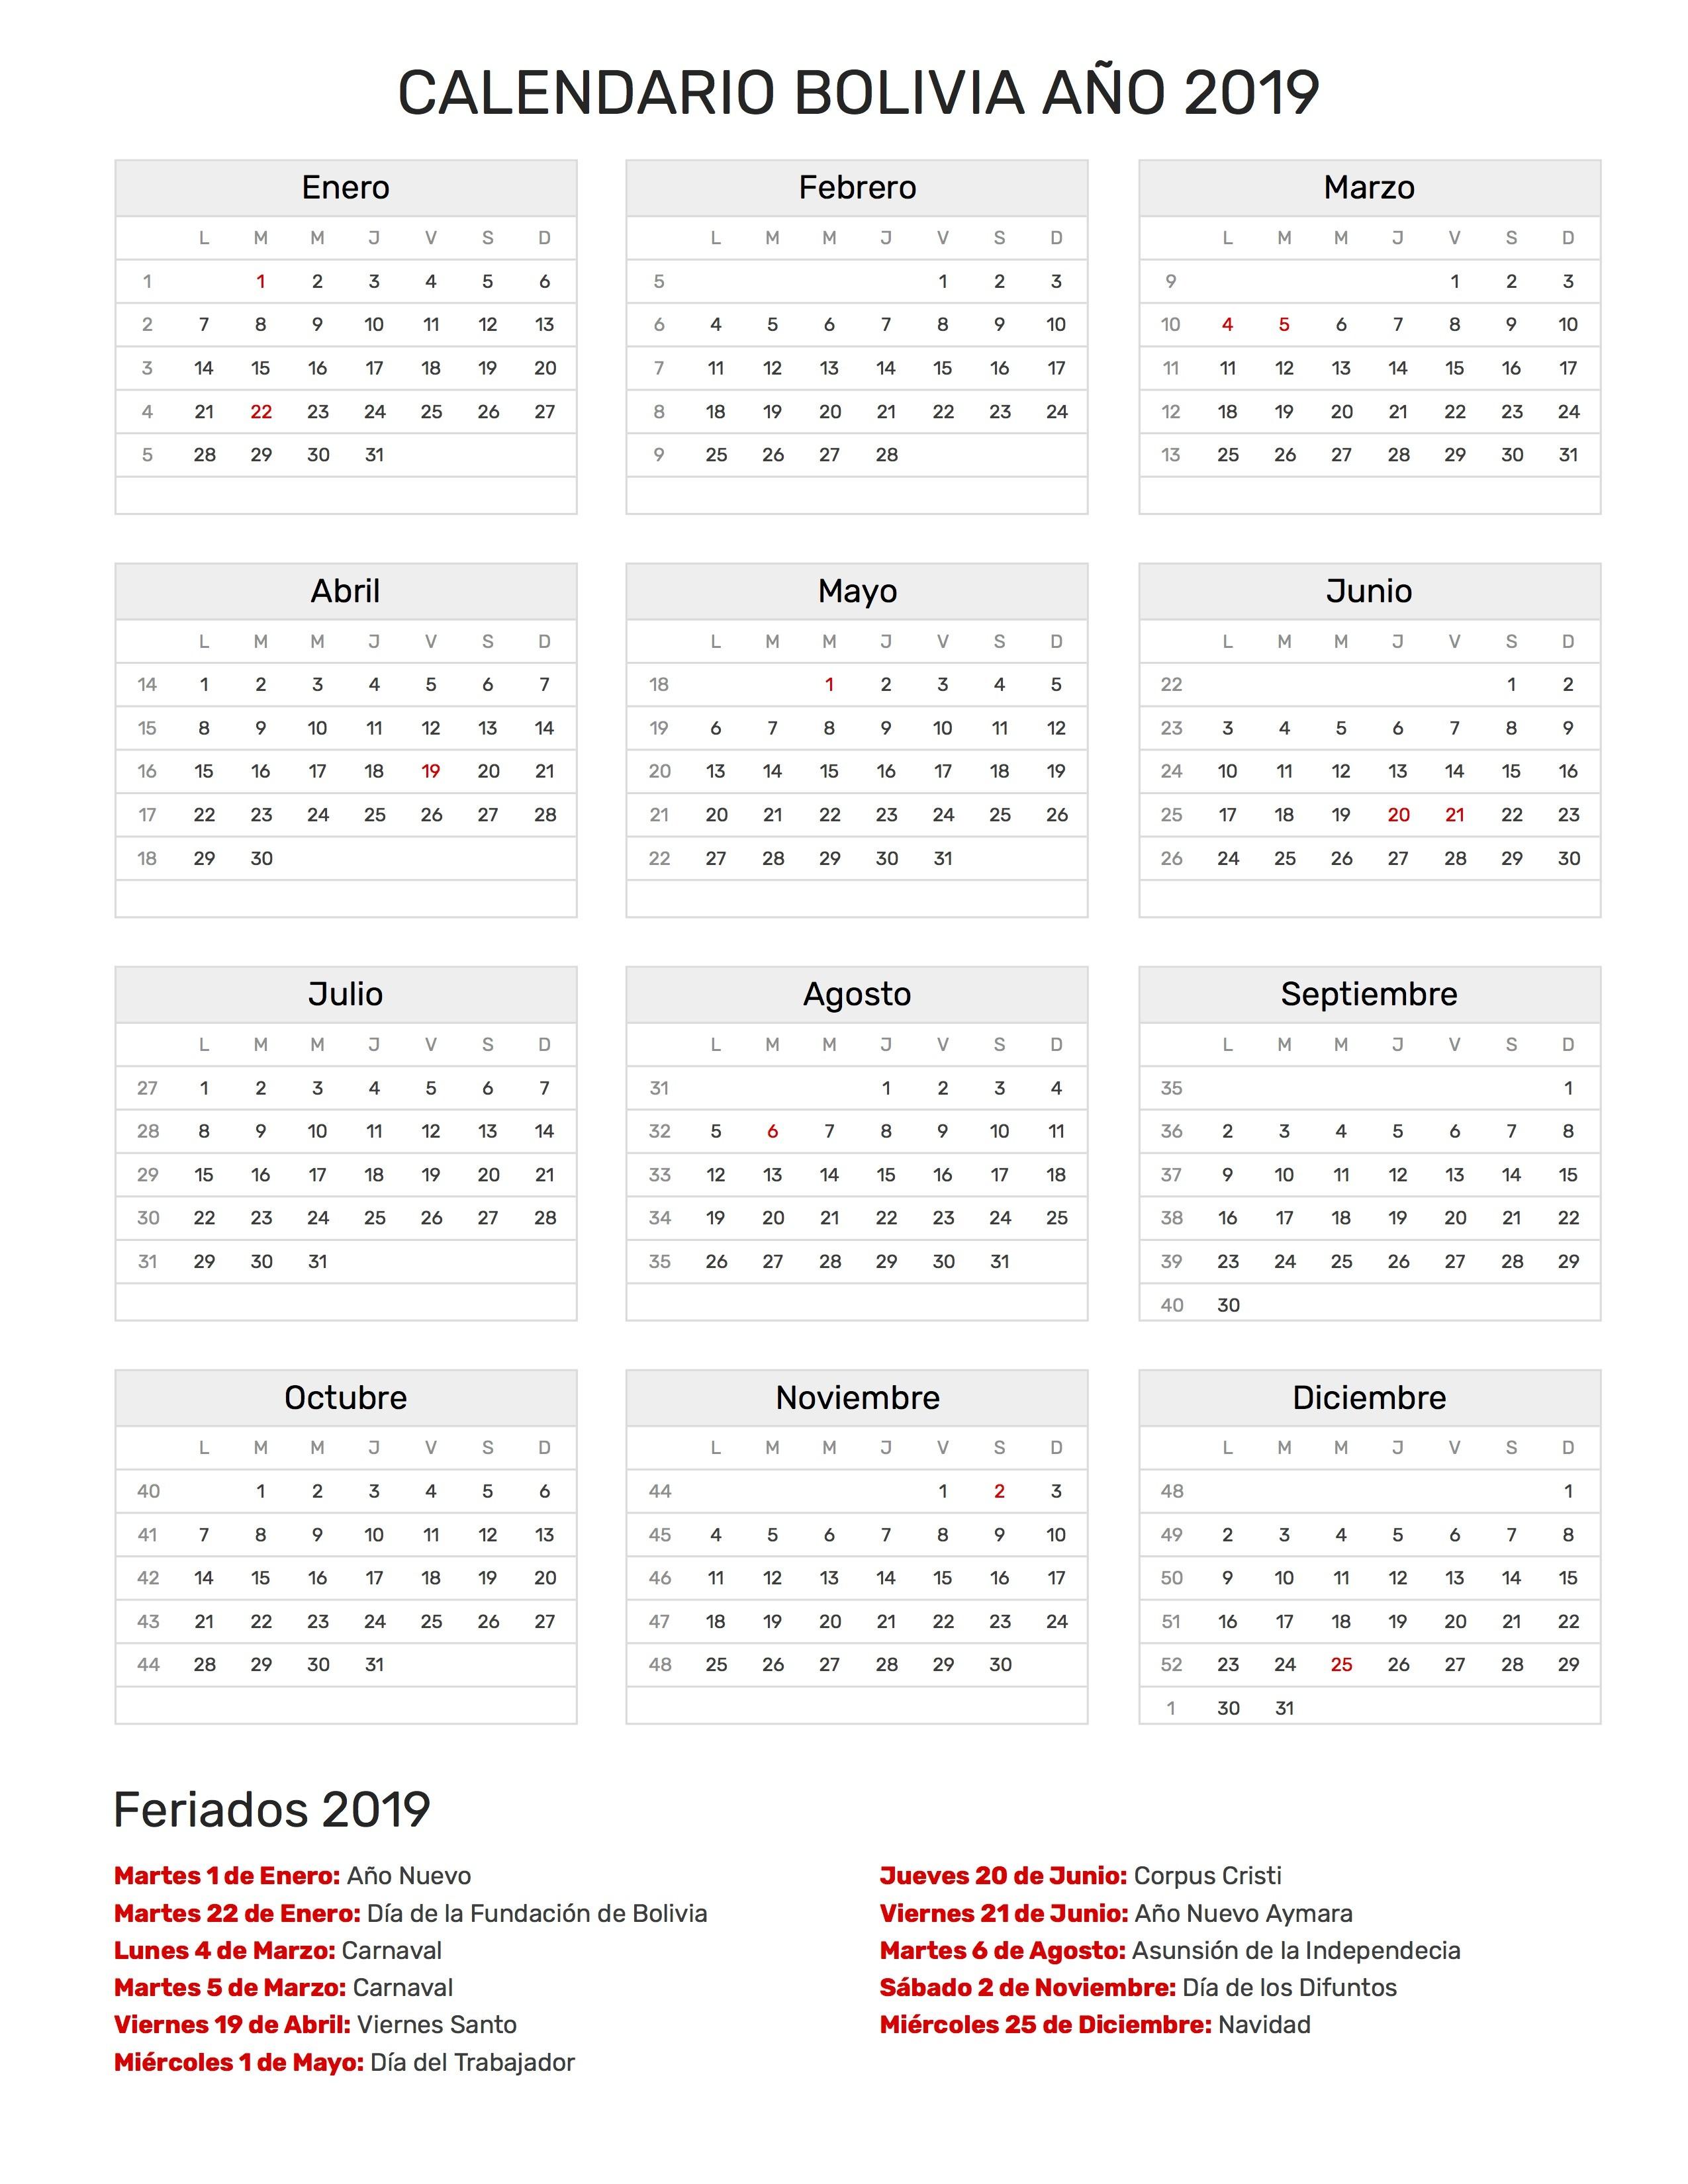 Calendario Mundial Rusia 2019 Para Imprimir Gratis Mejores Y Más Novedosos Calendario Bolivia A±o 2019 Of Calendario Mundial Rusia 2019 Para Imprimir Gratis Más Recientes Wall Calendar 2019 Planner Pinterest